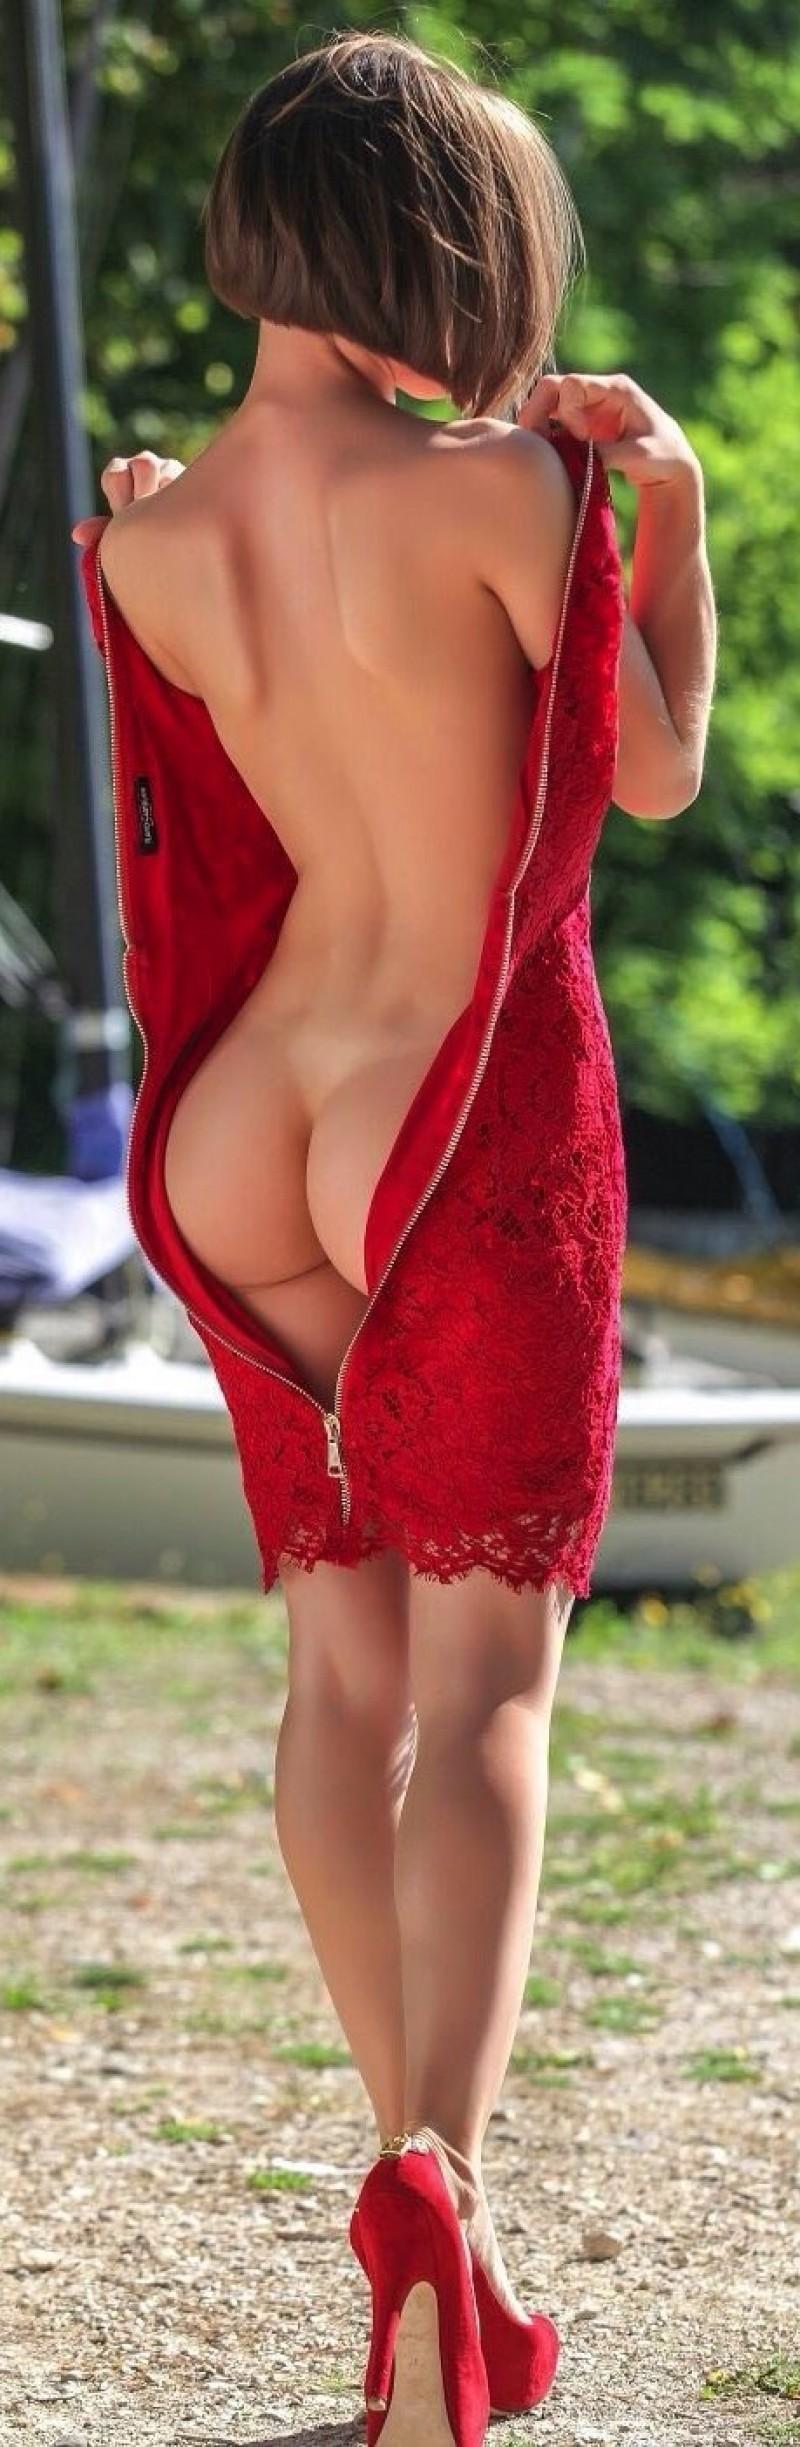 malay lagi budak sekolah mobile porno videos #ass #balcony #brunette #classy #clothed #exposed #heels #highheels #legs #longlegs #niceass #sexy #thass #upskirt #windy #windyhair